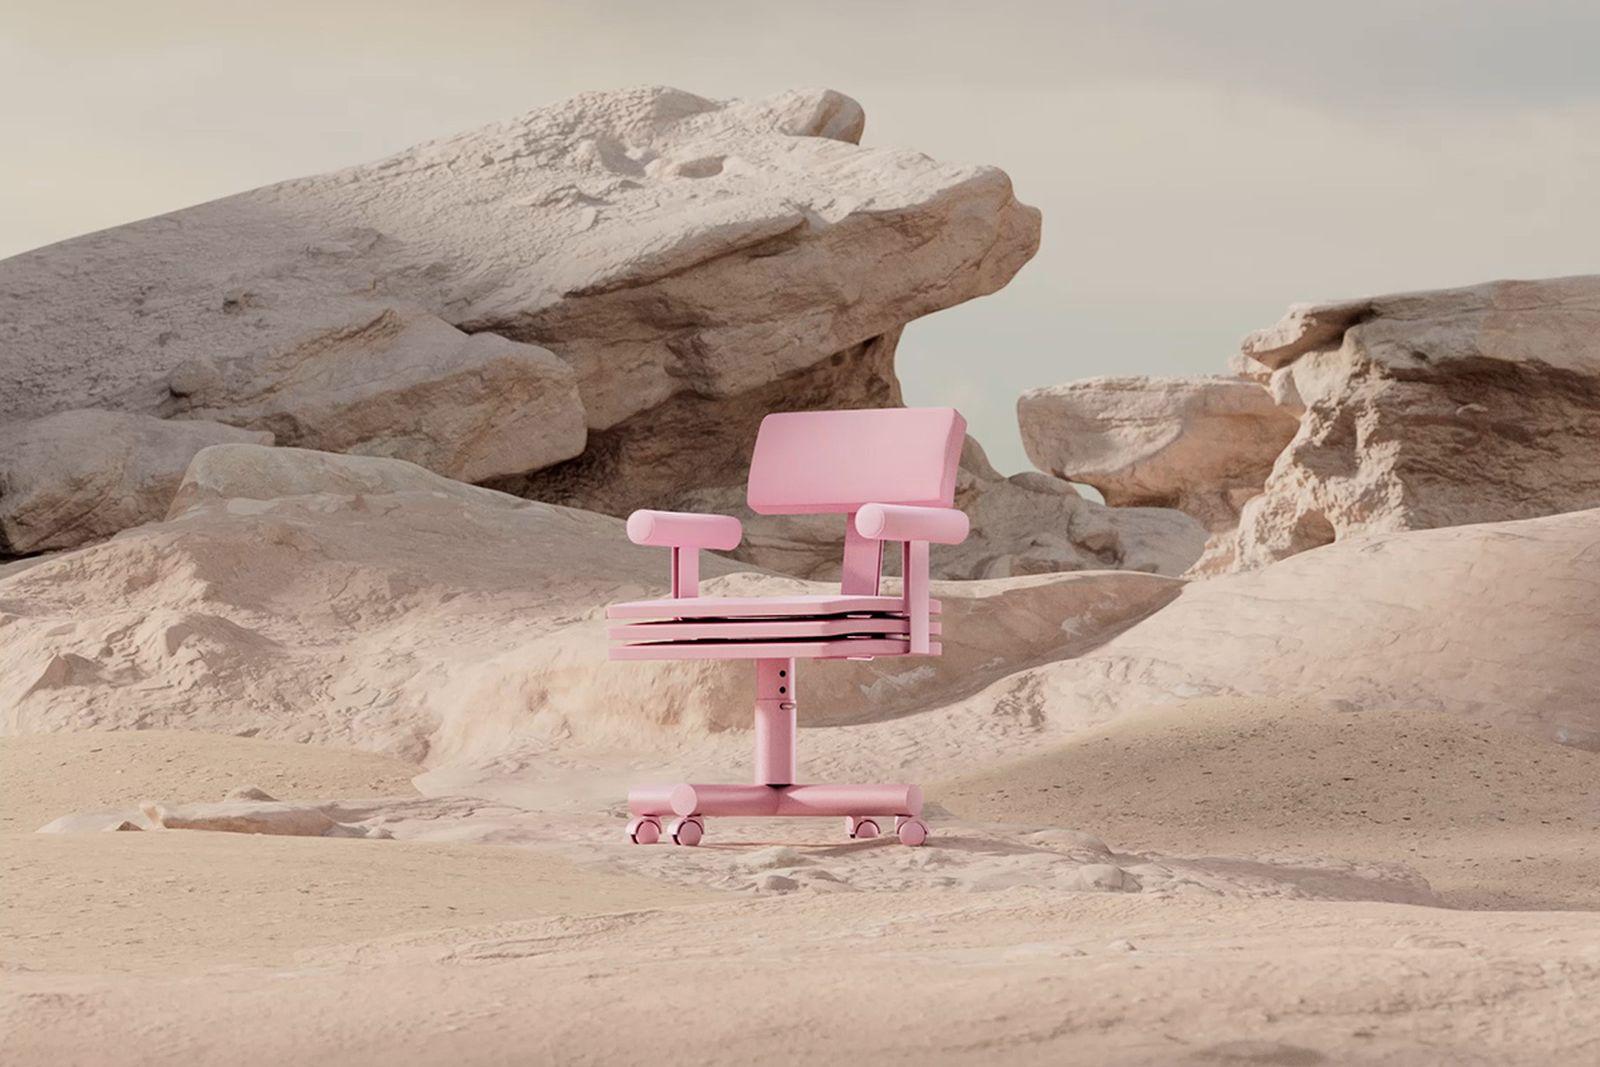 andres-reisinger-the-shipping-digital-furniture-auction-01